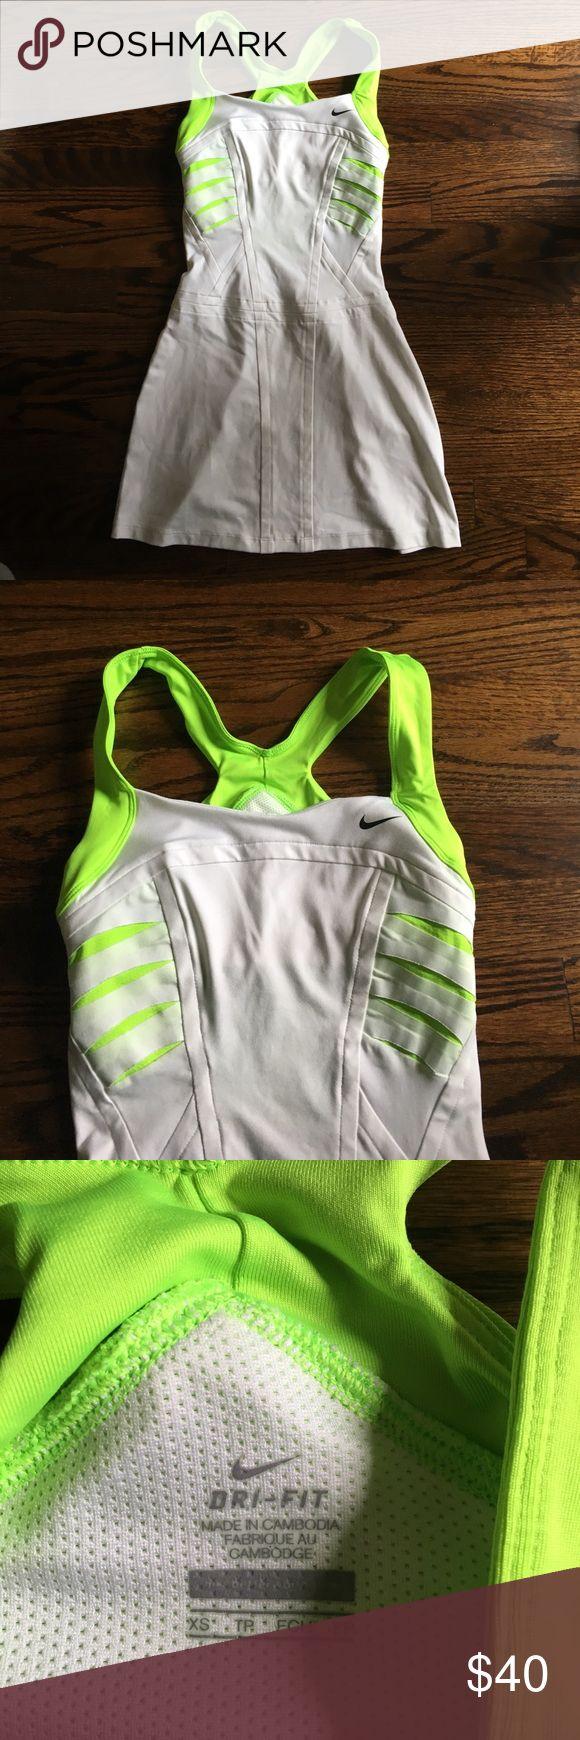 Nike Maria Sharapova Dress White and neon green tennis dress (worn once) Nike Dresses